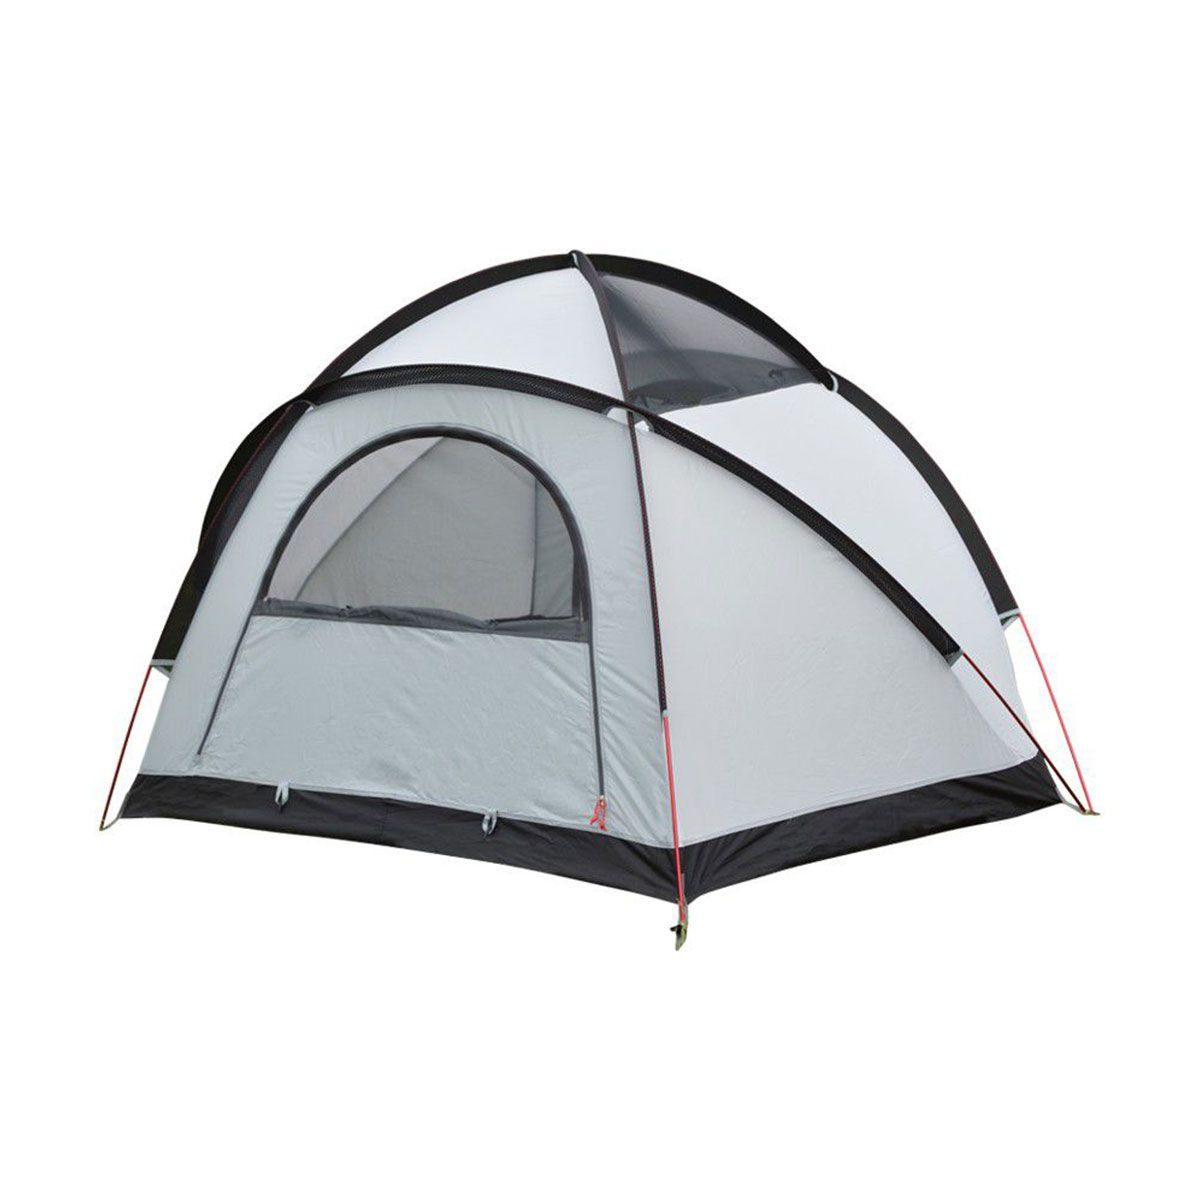 Barraca de Camping Azteq Himalaya 2/3 Pessoas